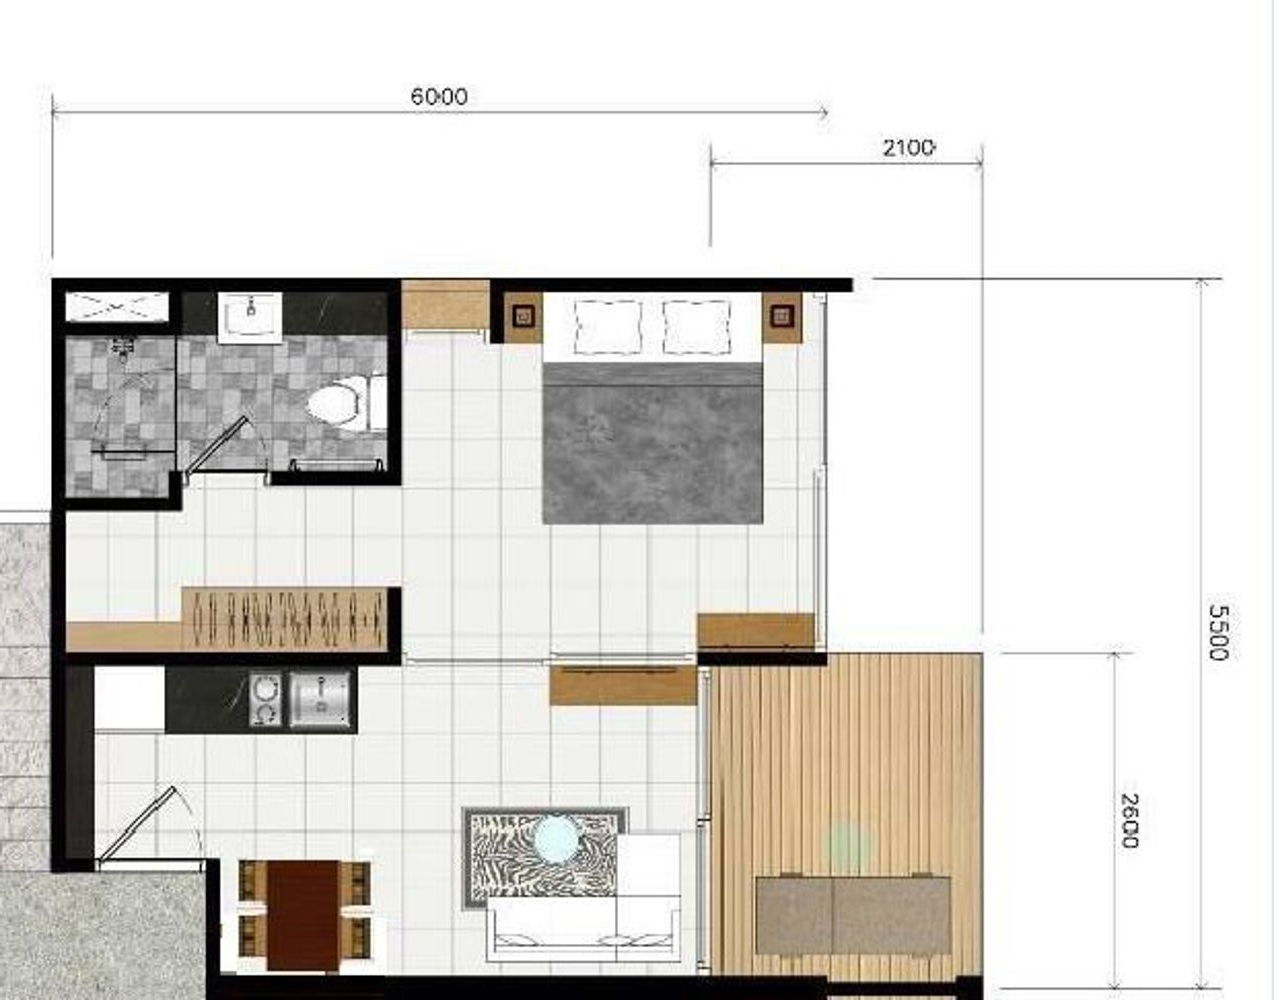 Phuket Holiday Services Naka Sea View Condominium Floor Plan